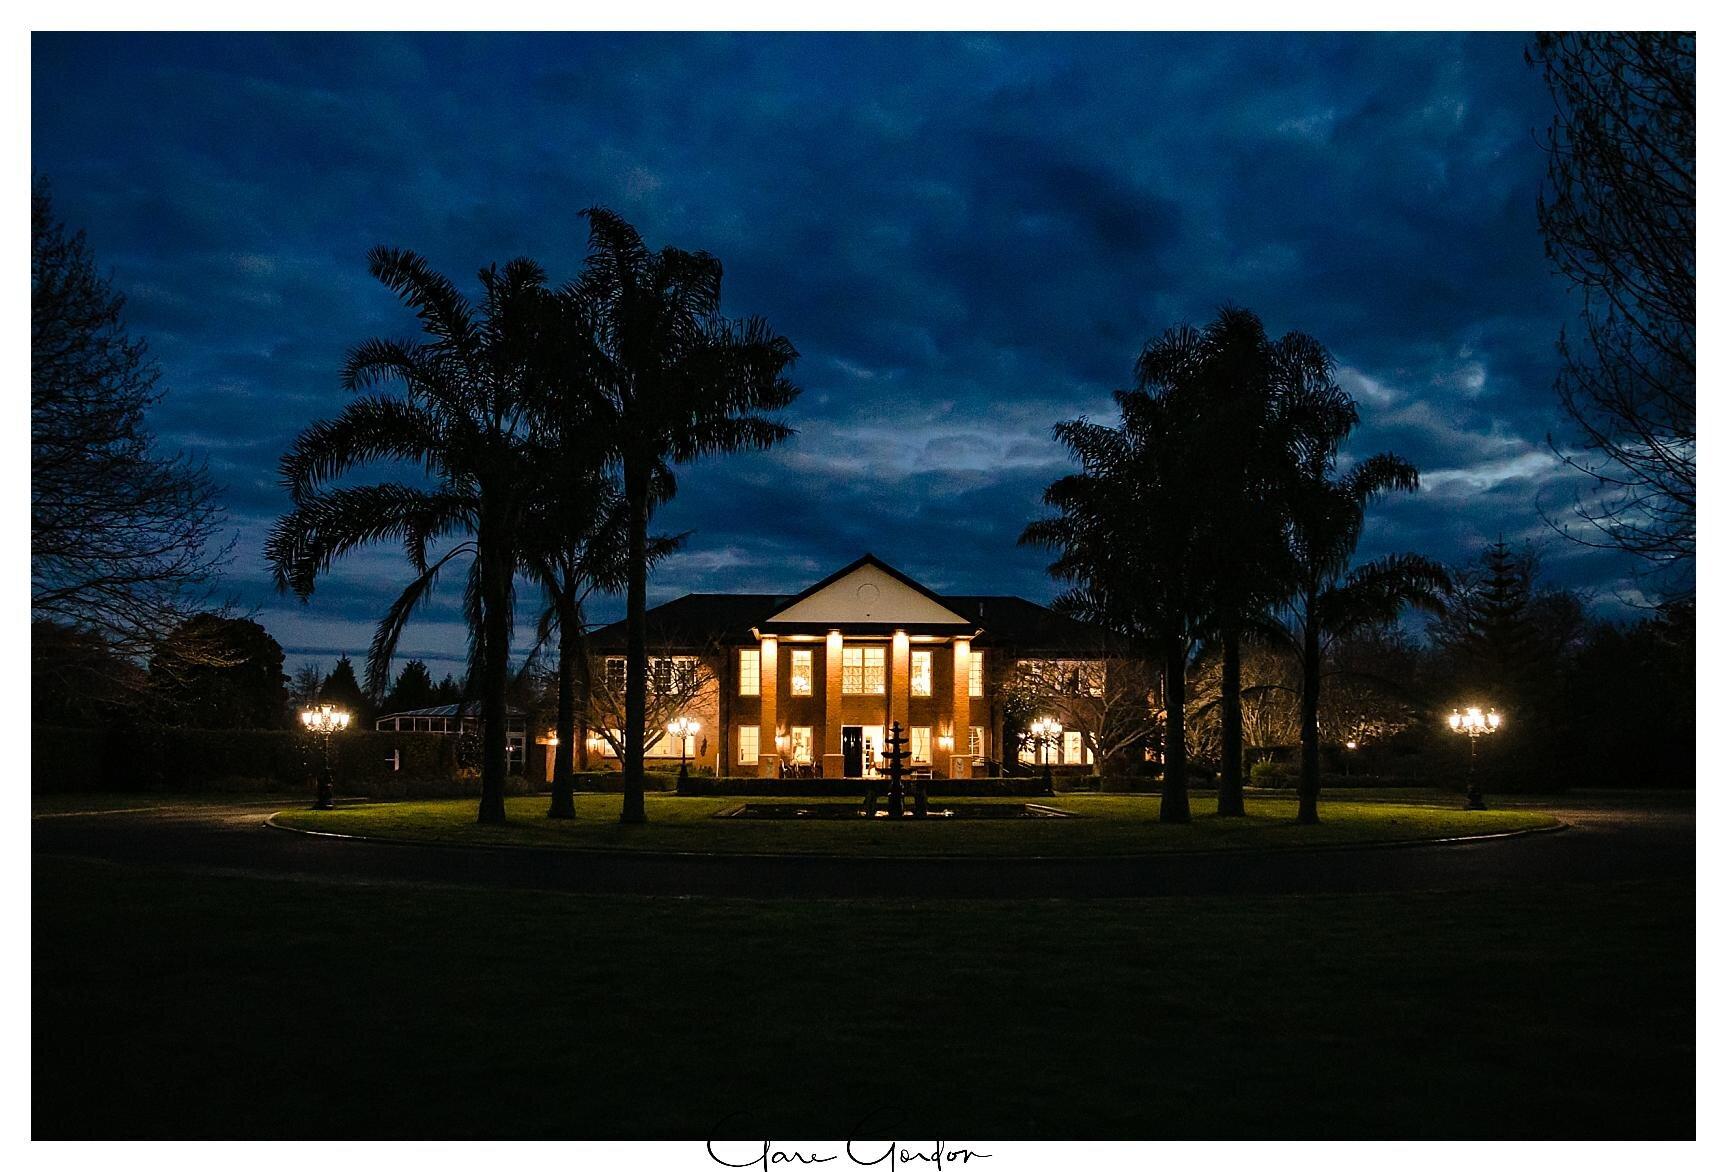 Henley-hotel-Cambridge-waikato-Clare-gordon-photography.jpg